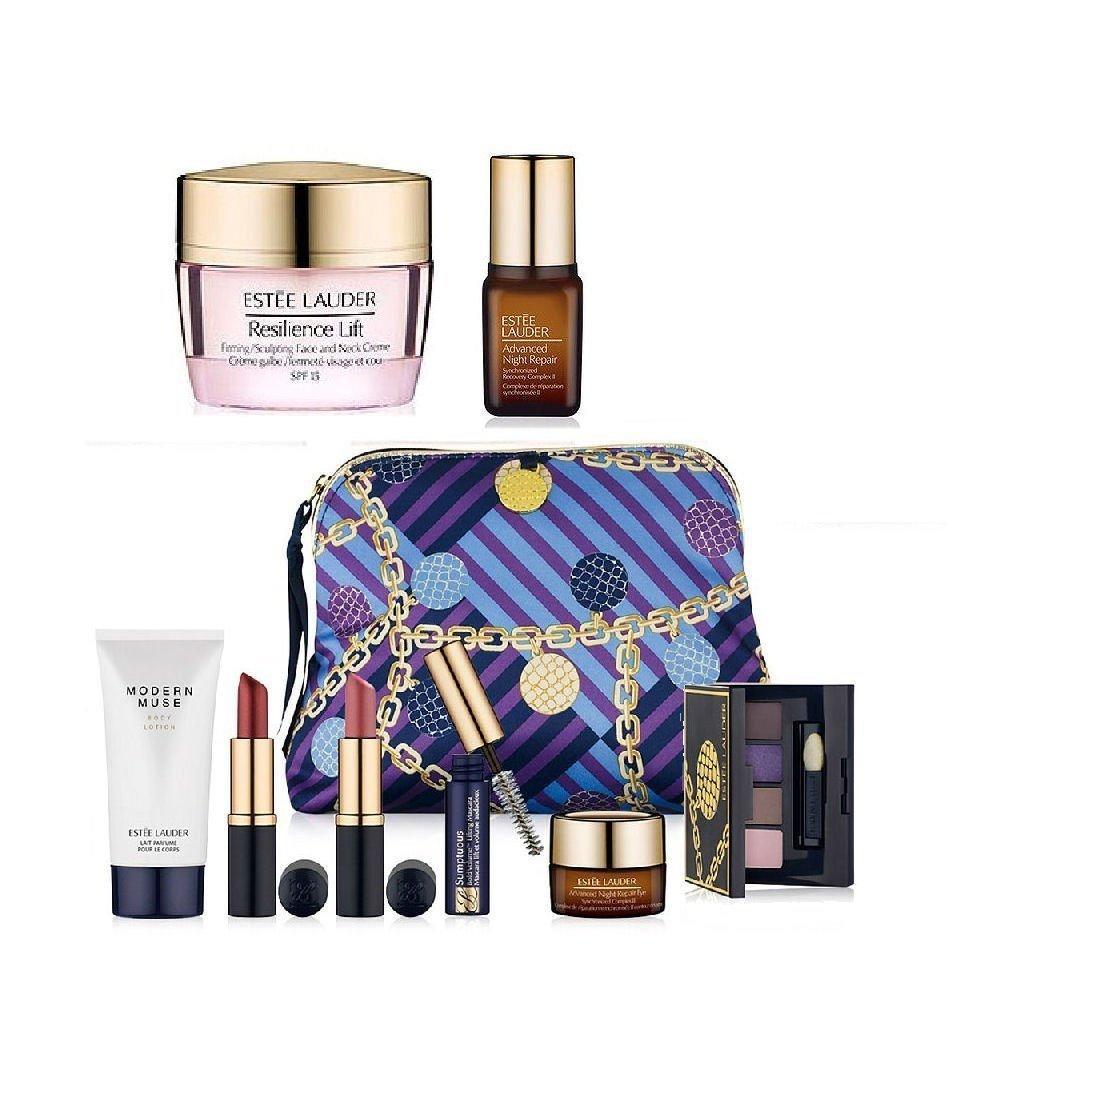 Amazon.com : Estee Lauder 2014 Blockbuster Luxe Color New Limited ...